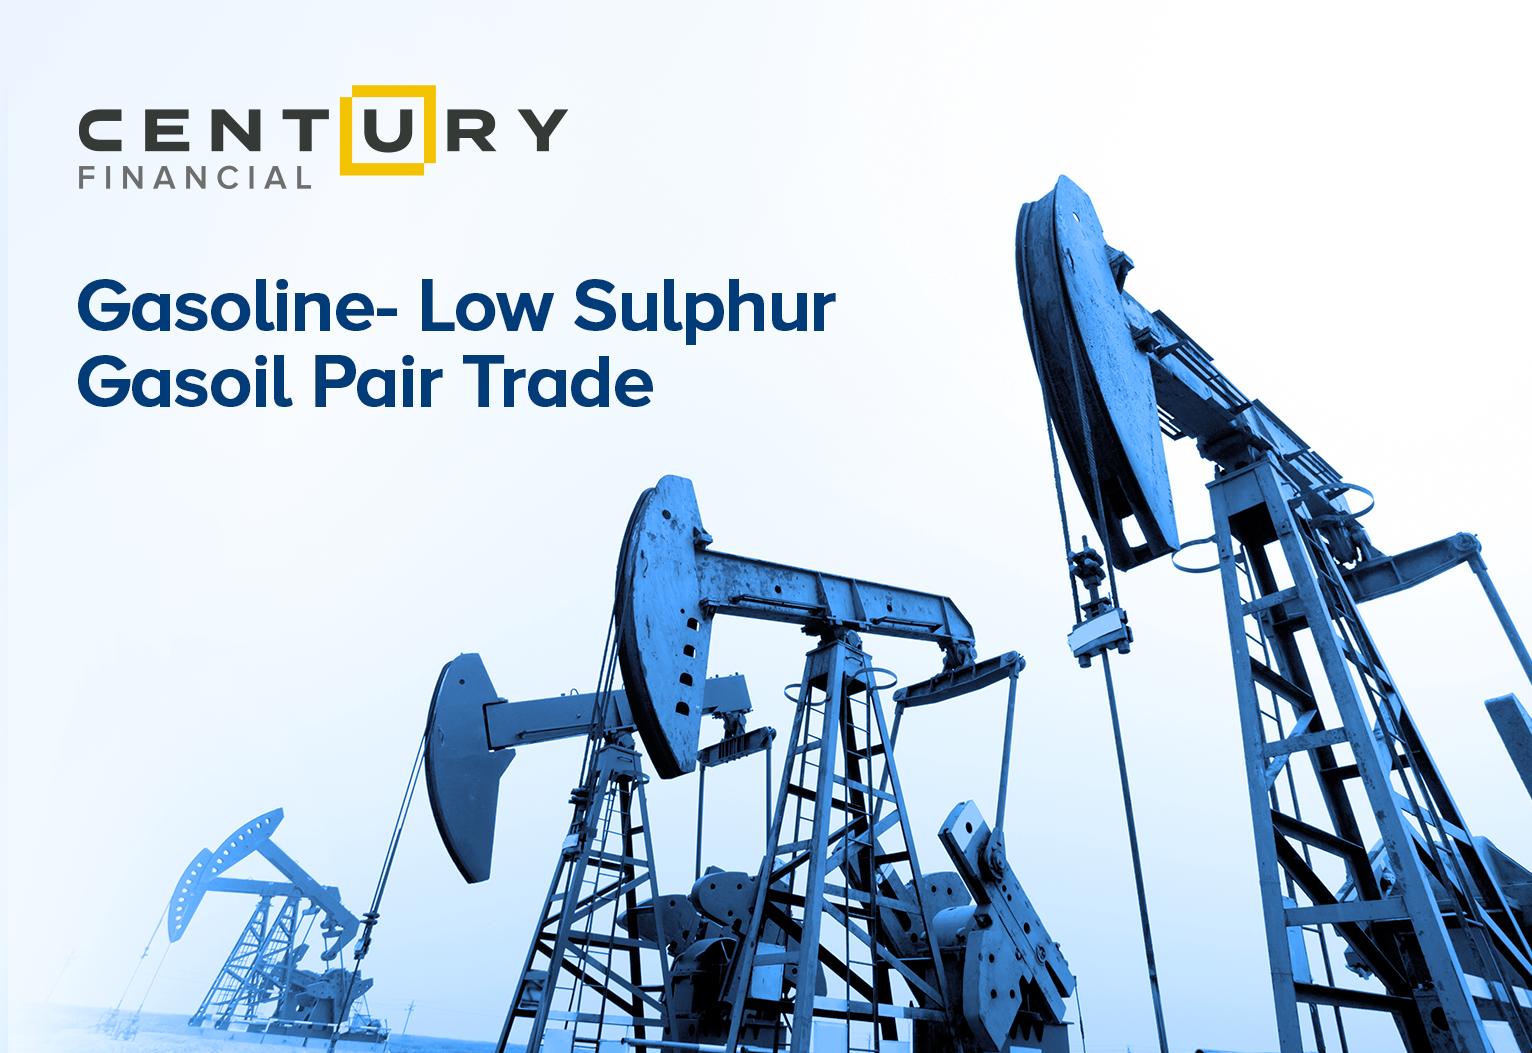 Gasoline - Low Sulphur Gasoil Pair Trade